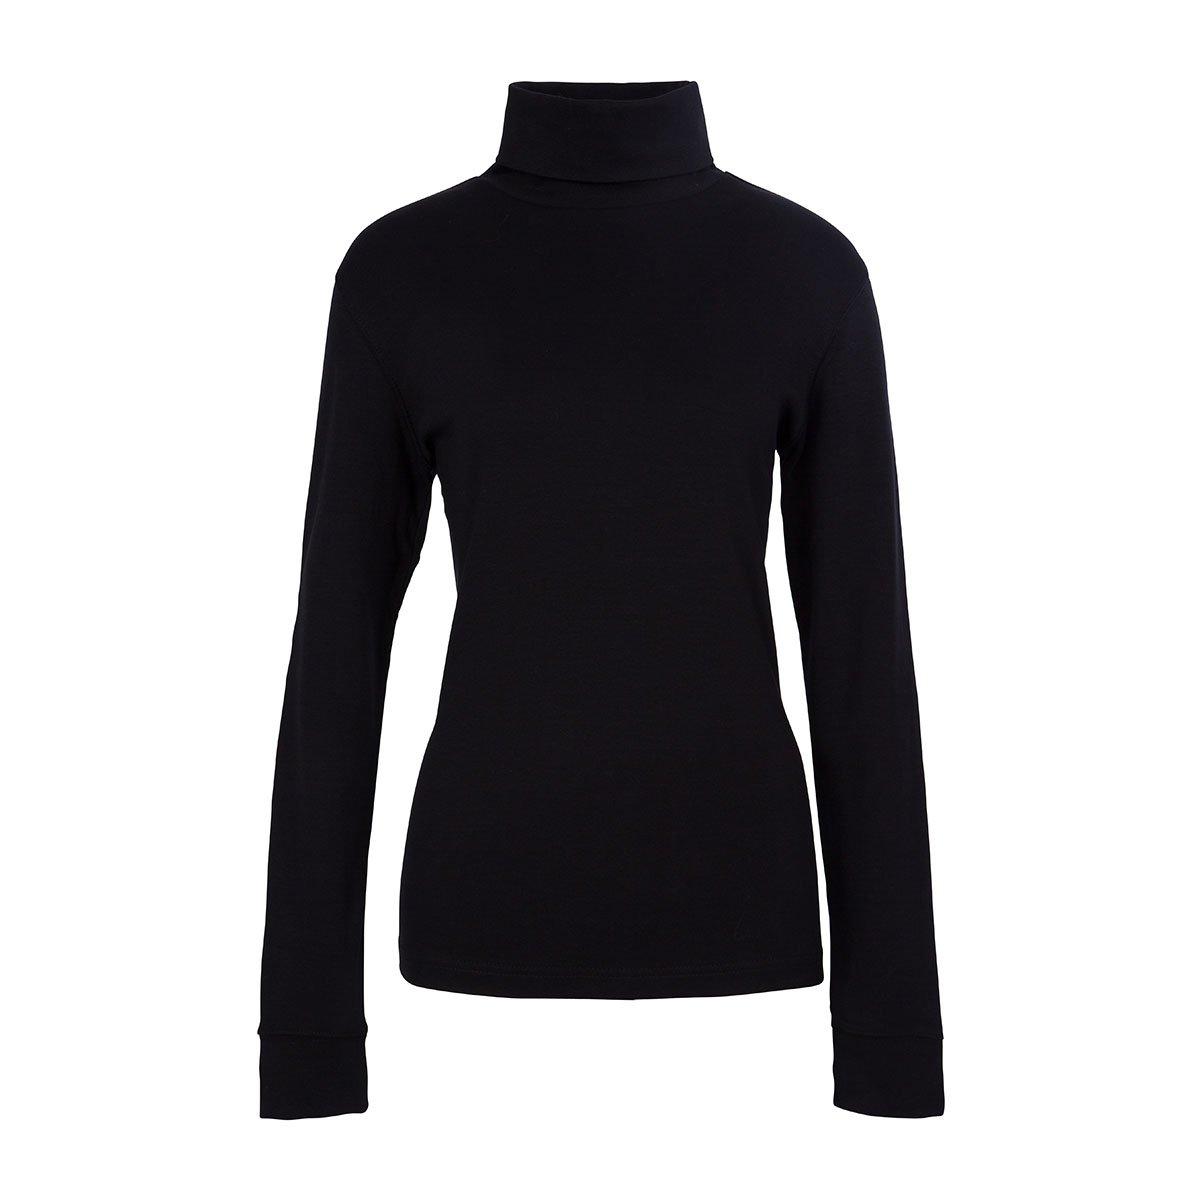 a188e866581f91 Amazon.com : Meister Women's Cotton/Blend Roll Neck Turtleneck Top :  Clothing